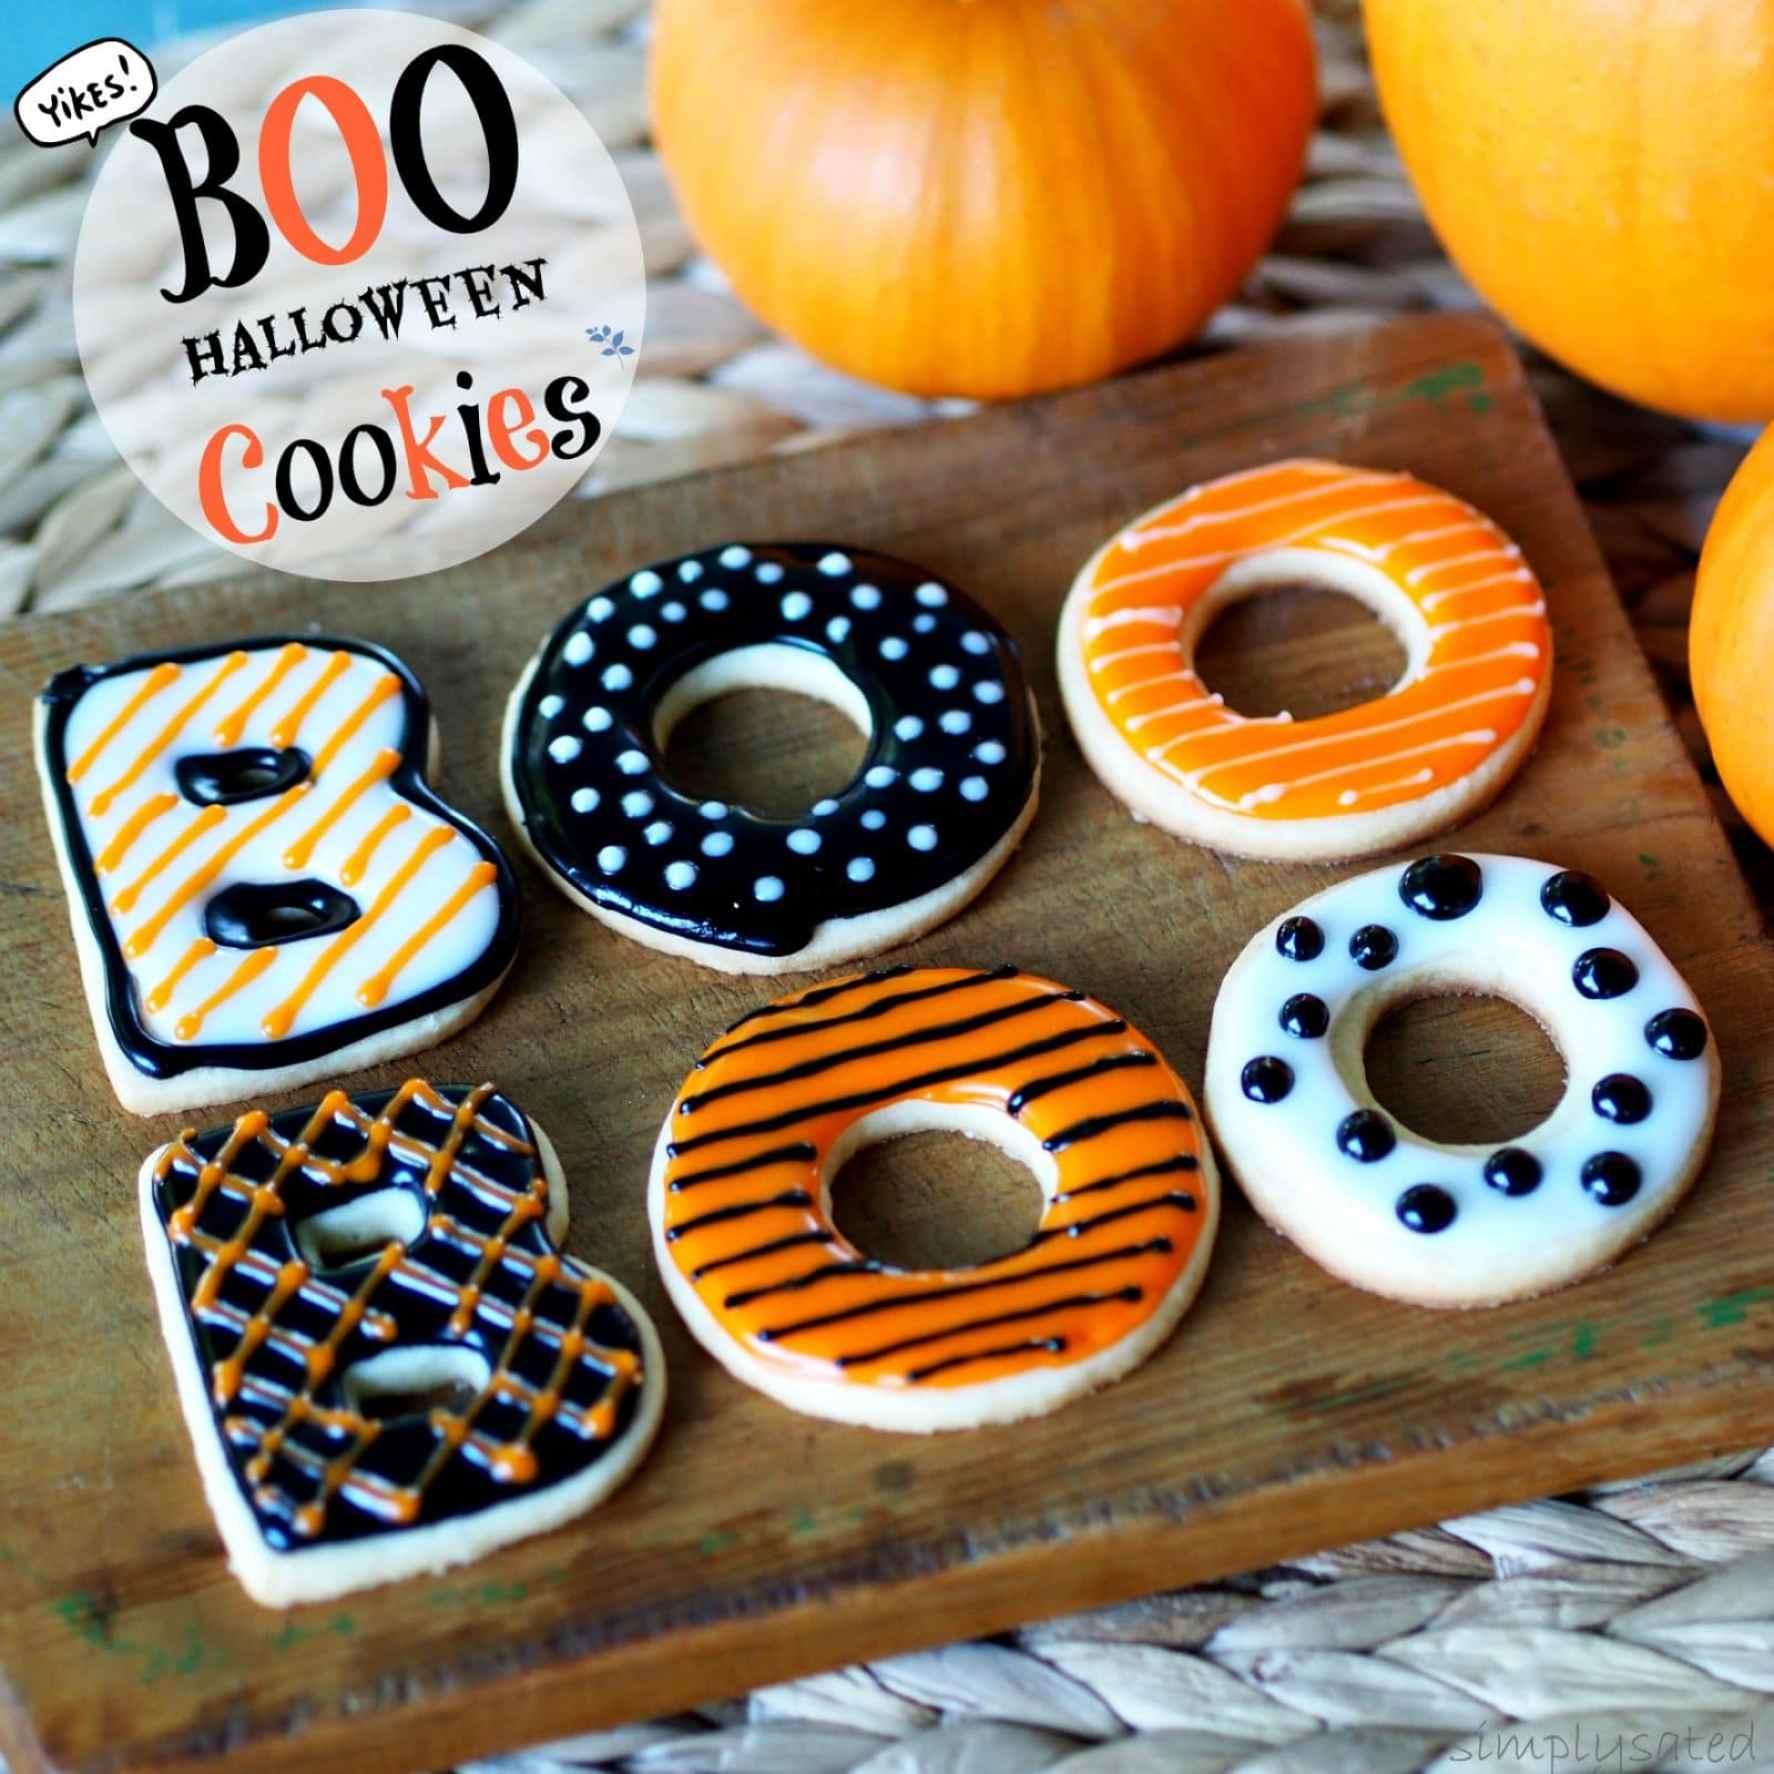 BOO Halloween Cookies